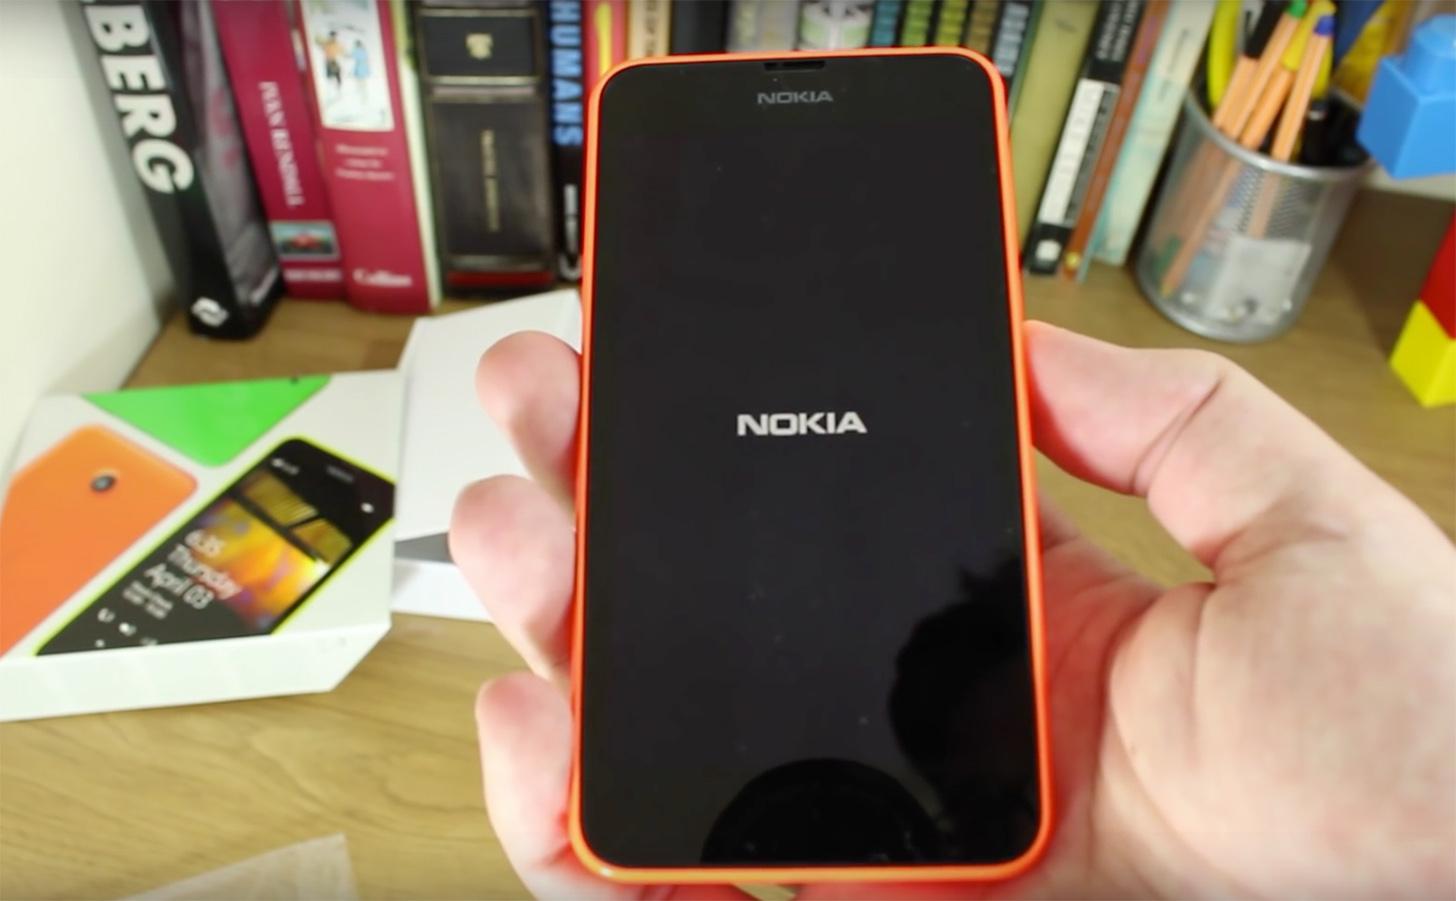 NokiaWillMakeSmartphonesAgain